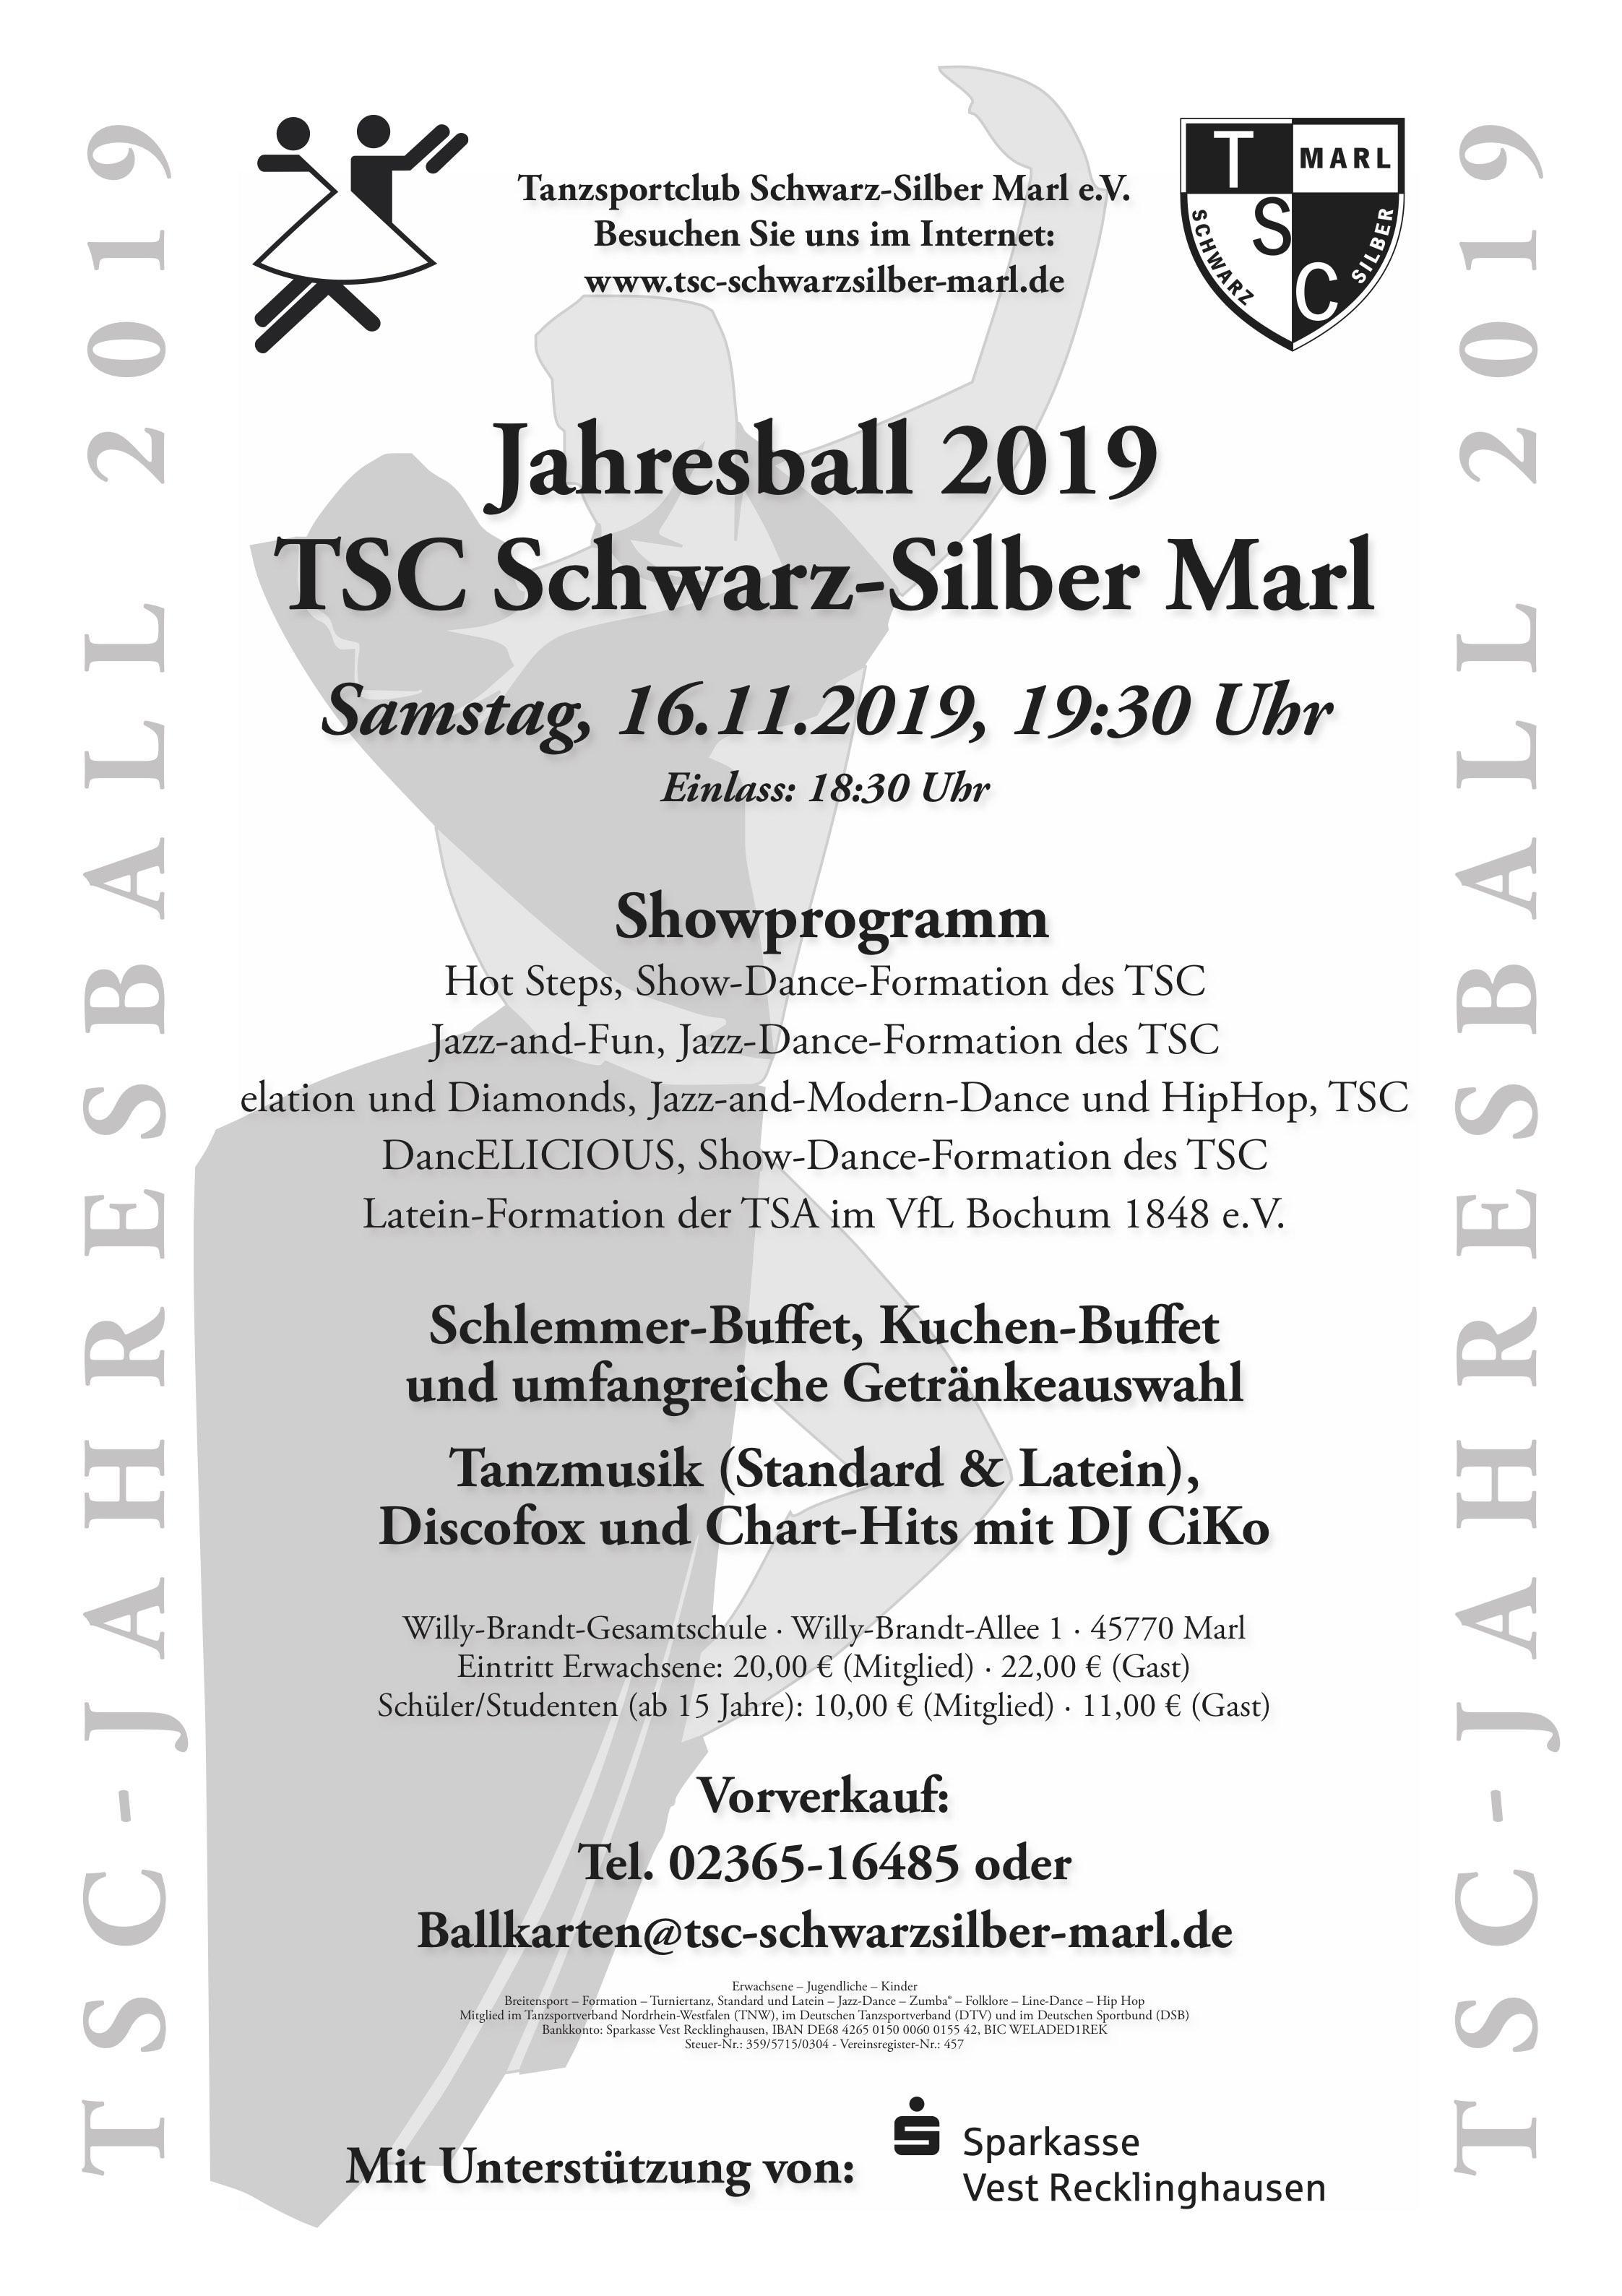 16.11.2019 - Jahresball des TSC